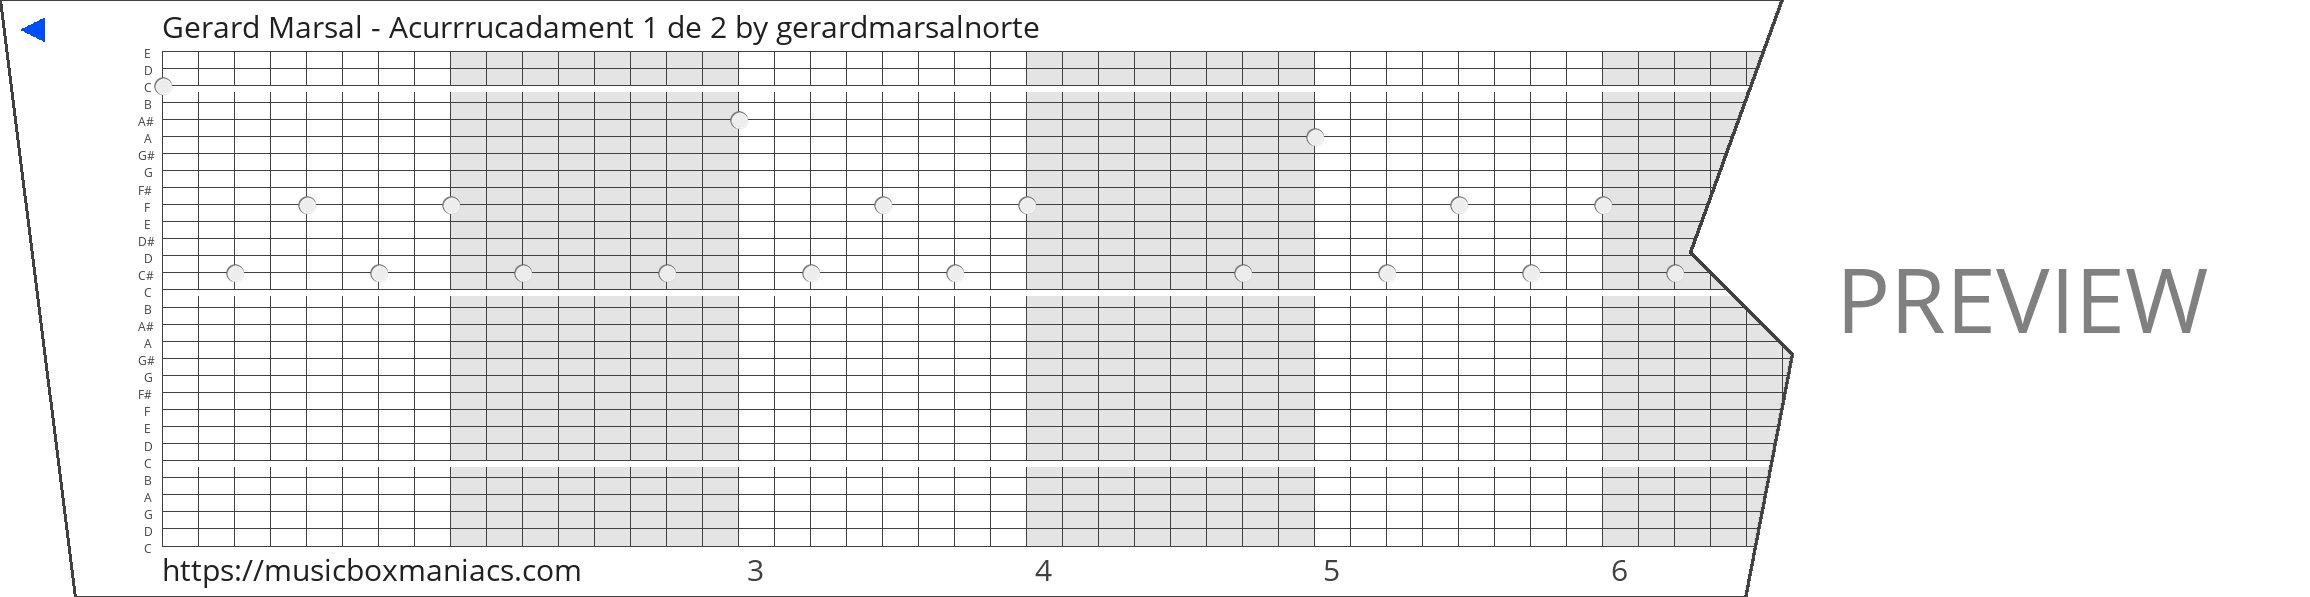 Gerard Marsal - Acurrrucadament 1 de 2 30 note music box paper strip